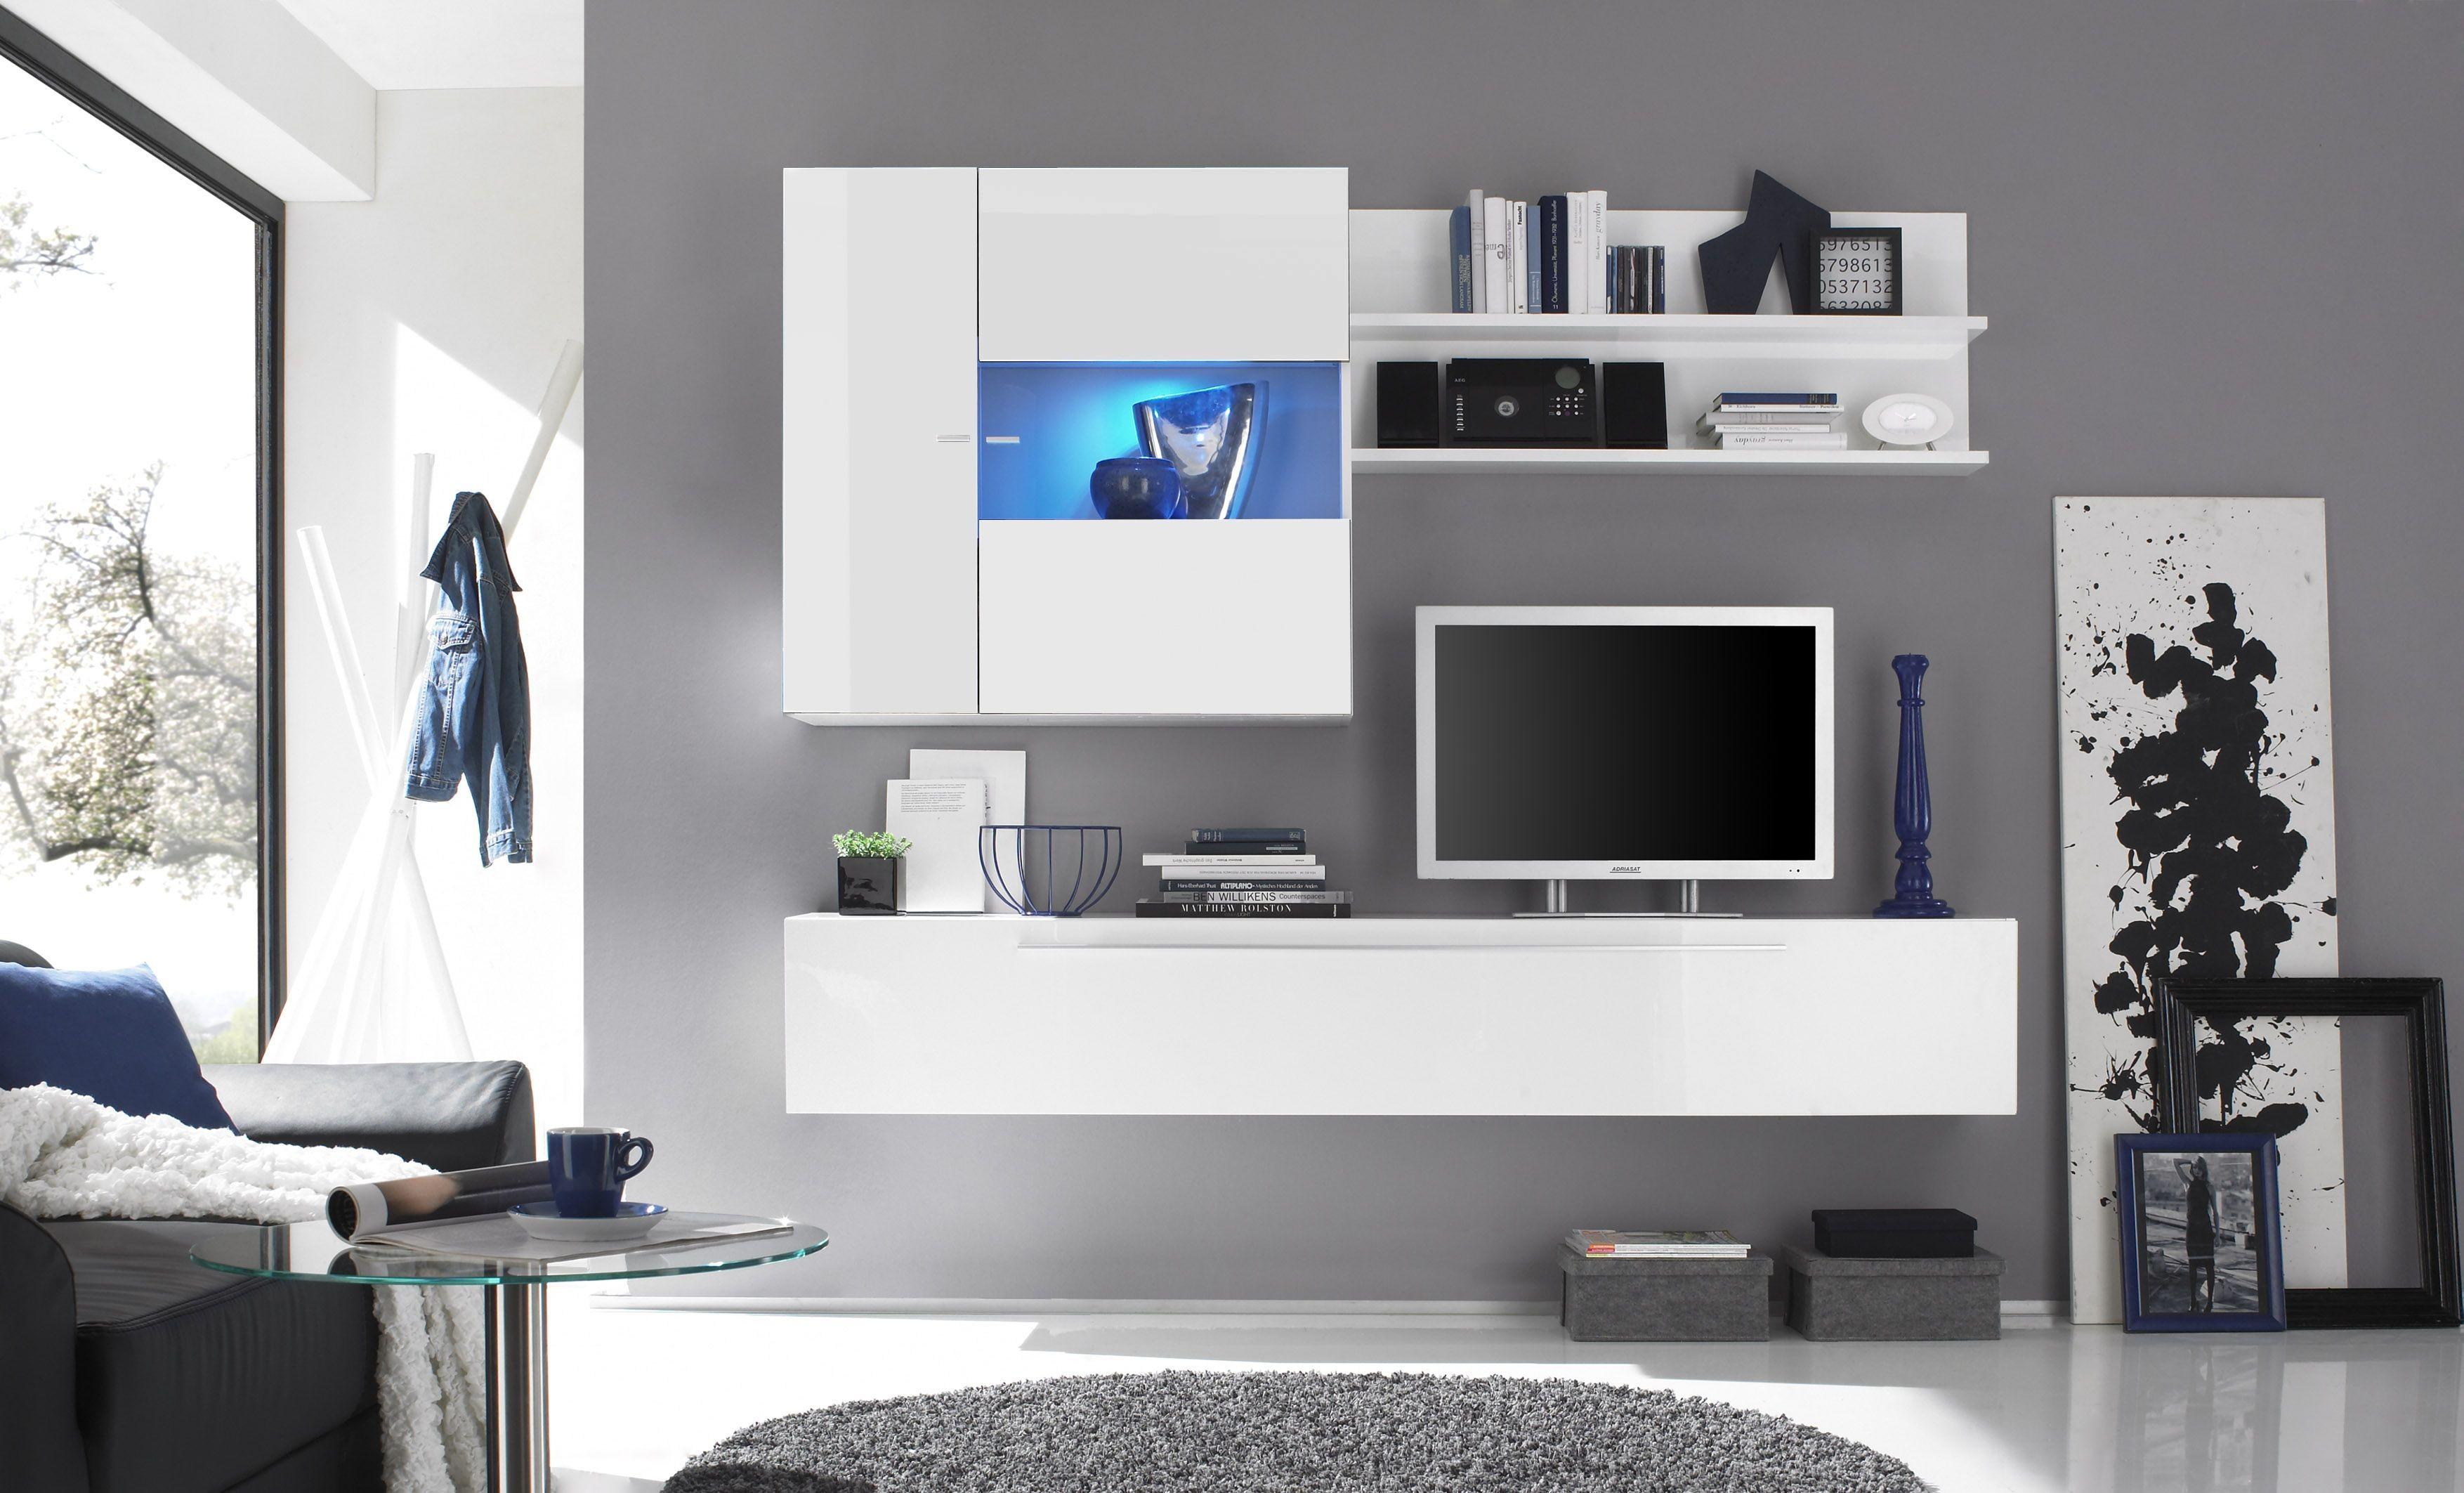 meuble tv mural - Meuble Tv A Led Blanc Laque Tron